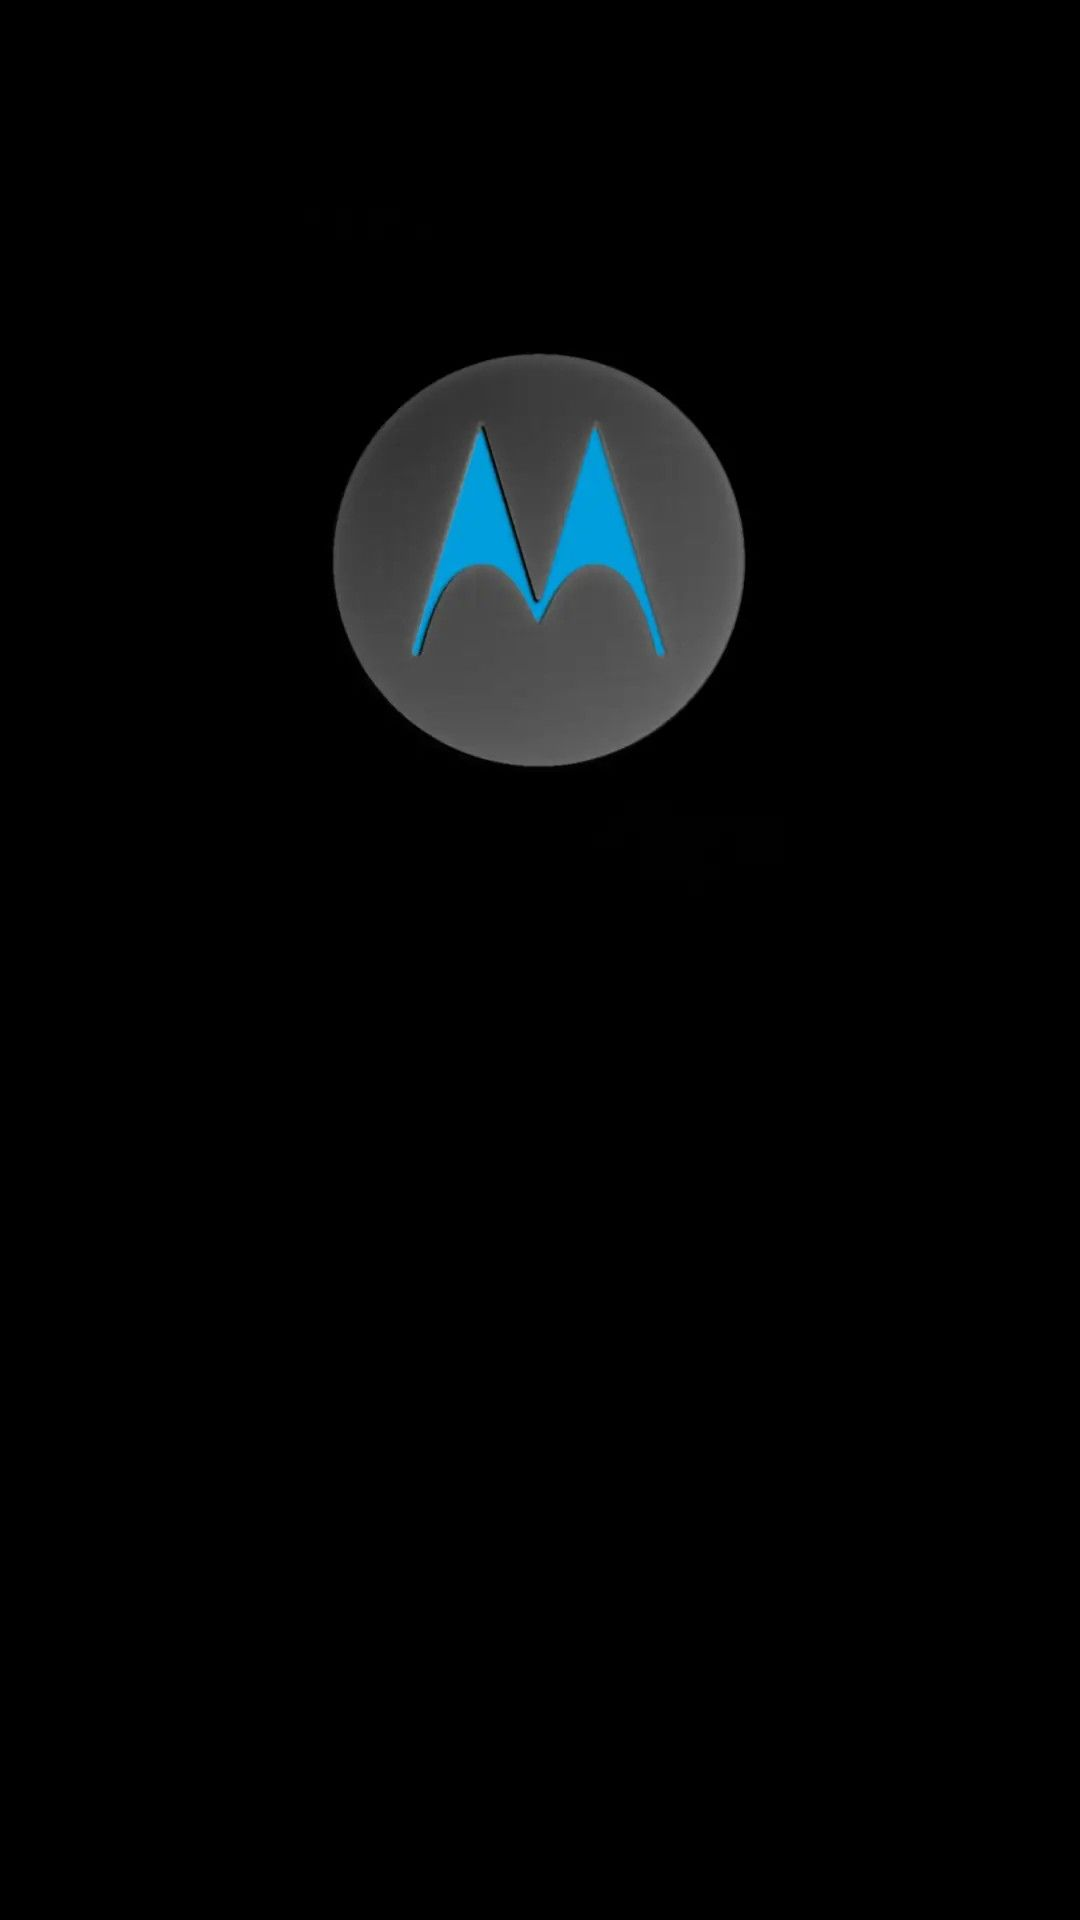 Pin De Tj Oconnor Em Motorola Papeis De Parede Da Motorola Papeis De Parede Escuros Para Celular Papel De Parede Android